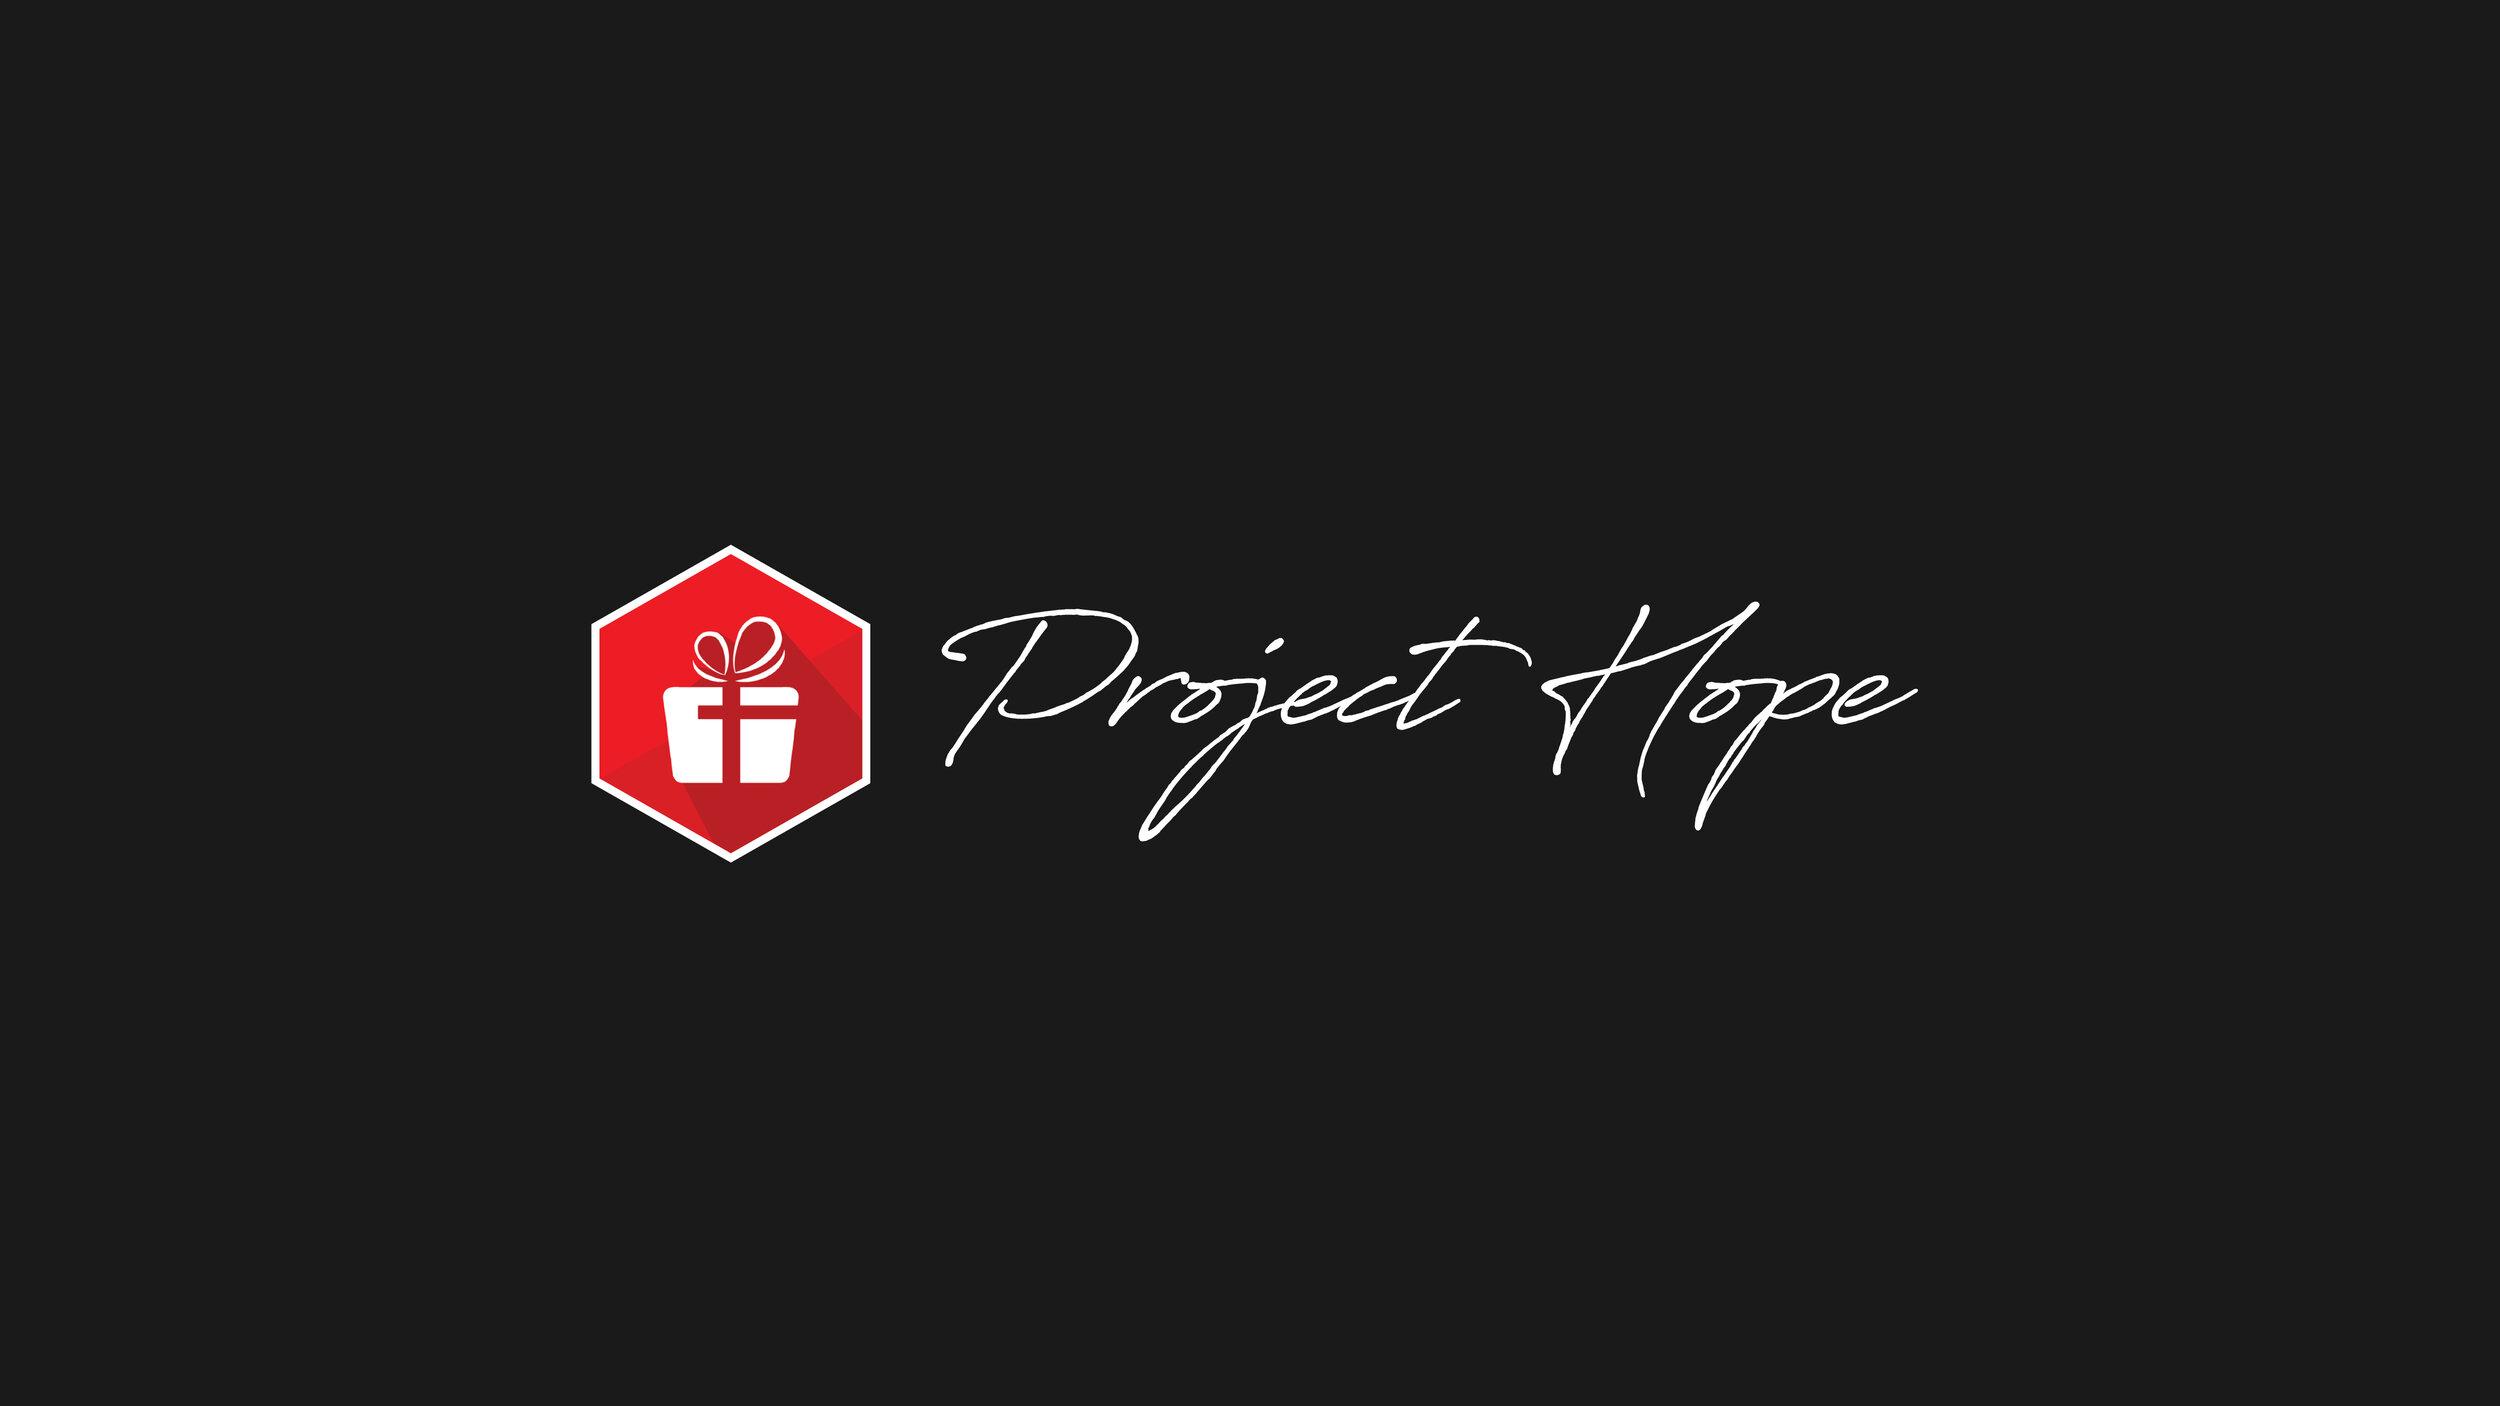 Project Hope Logo 16x9-01.jpg